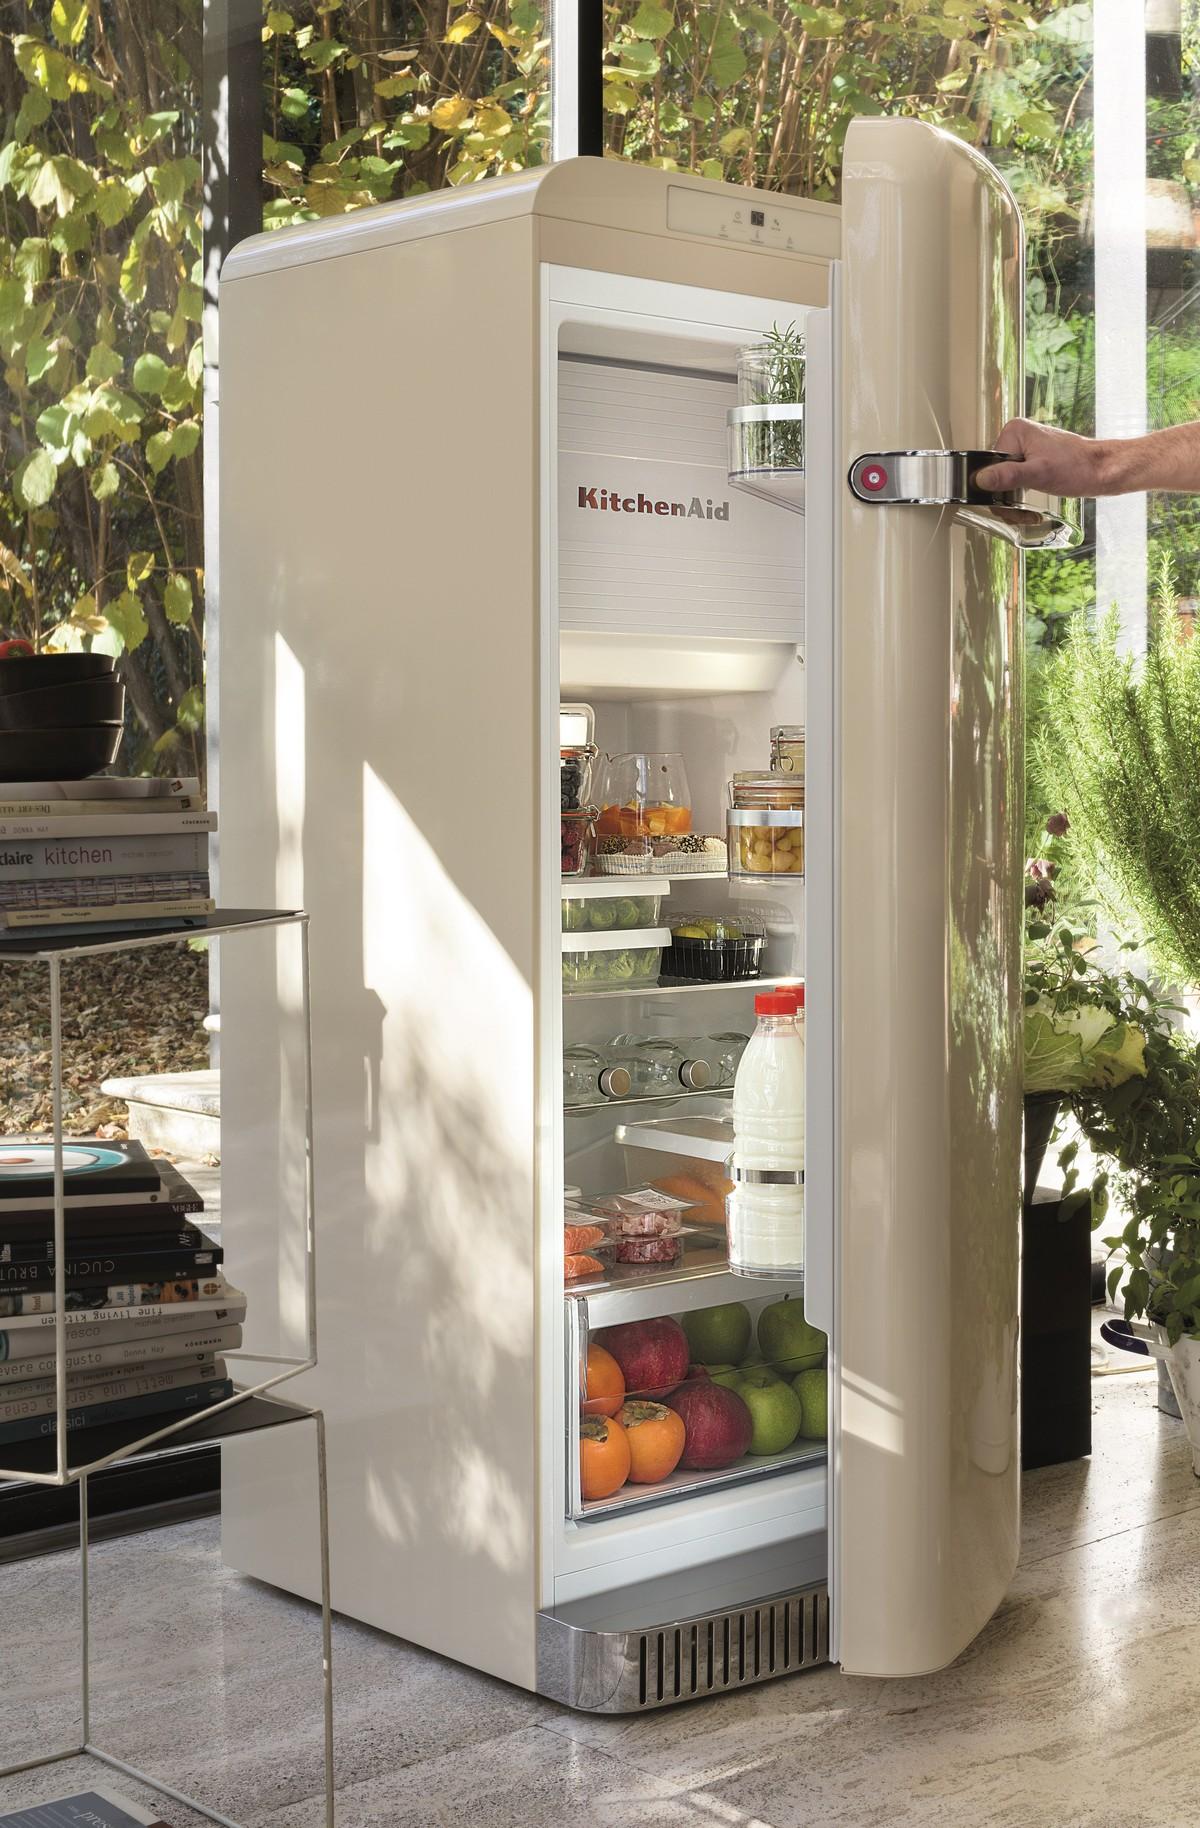 KitchenAid elettrodomestici novità 2019